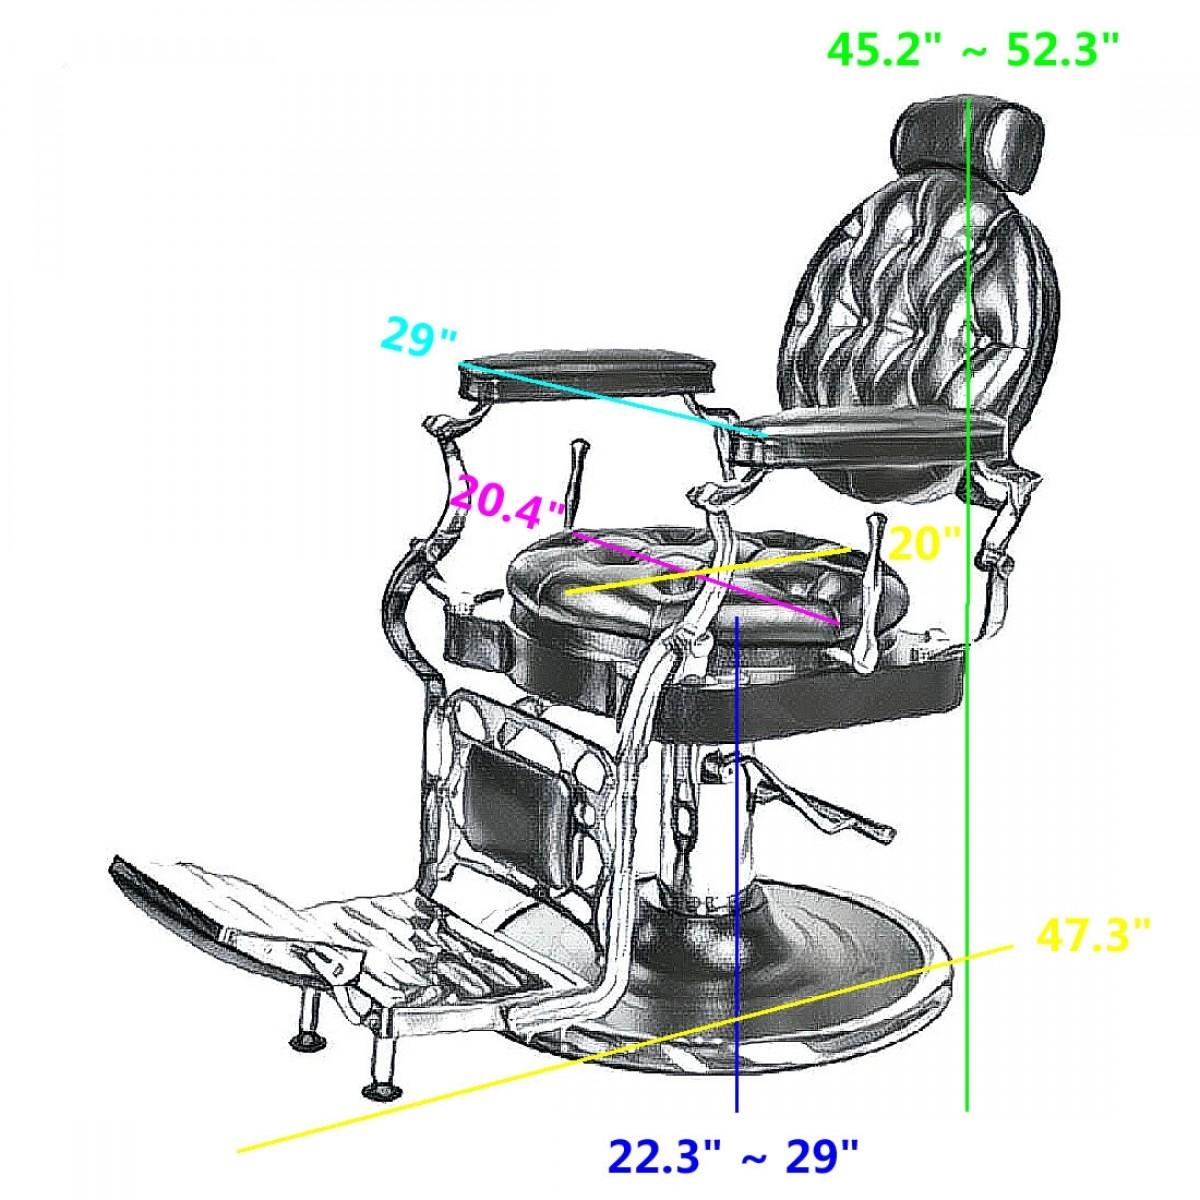 Hair cutting chair dimensions -  Justinian Antique Barber Chair Free Shipping